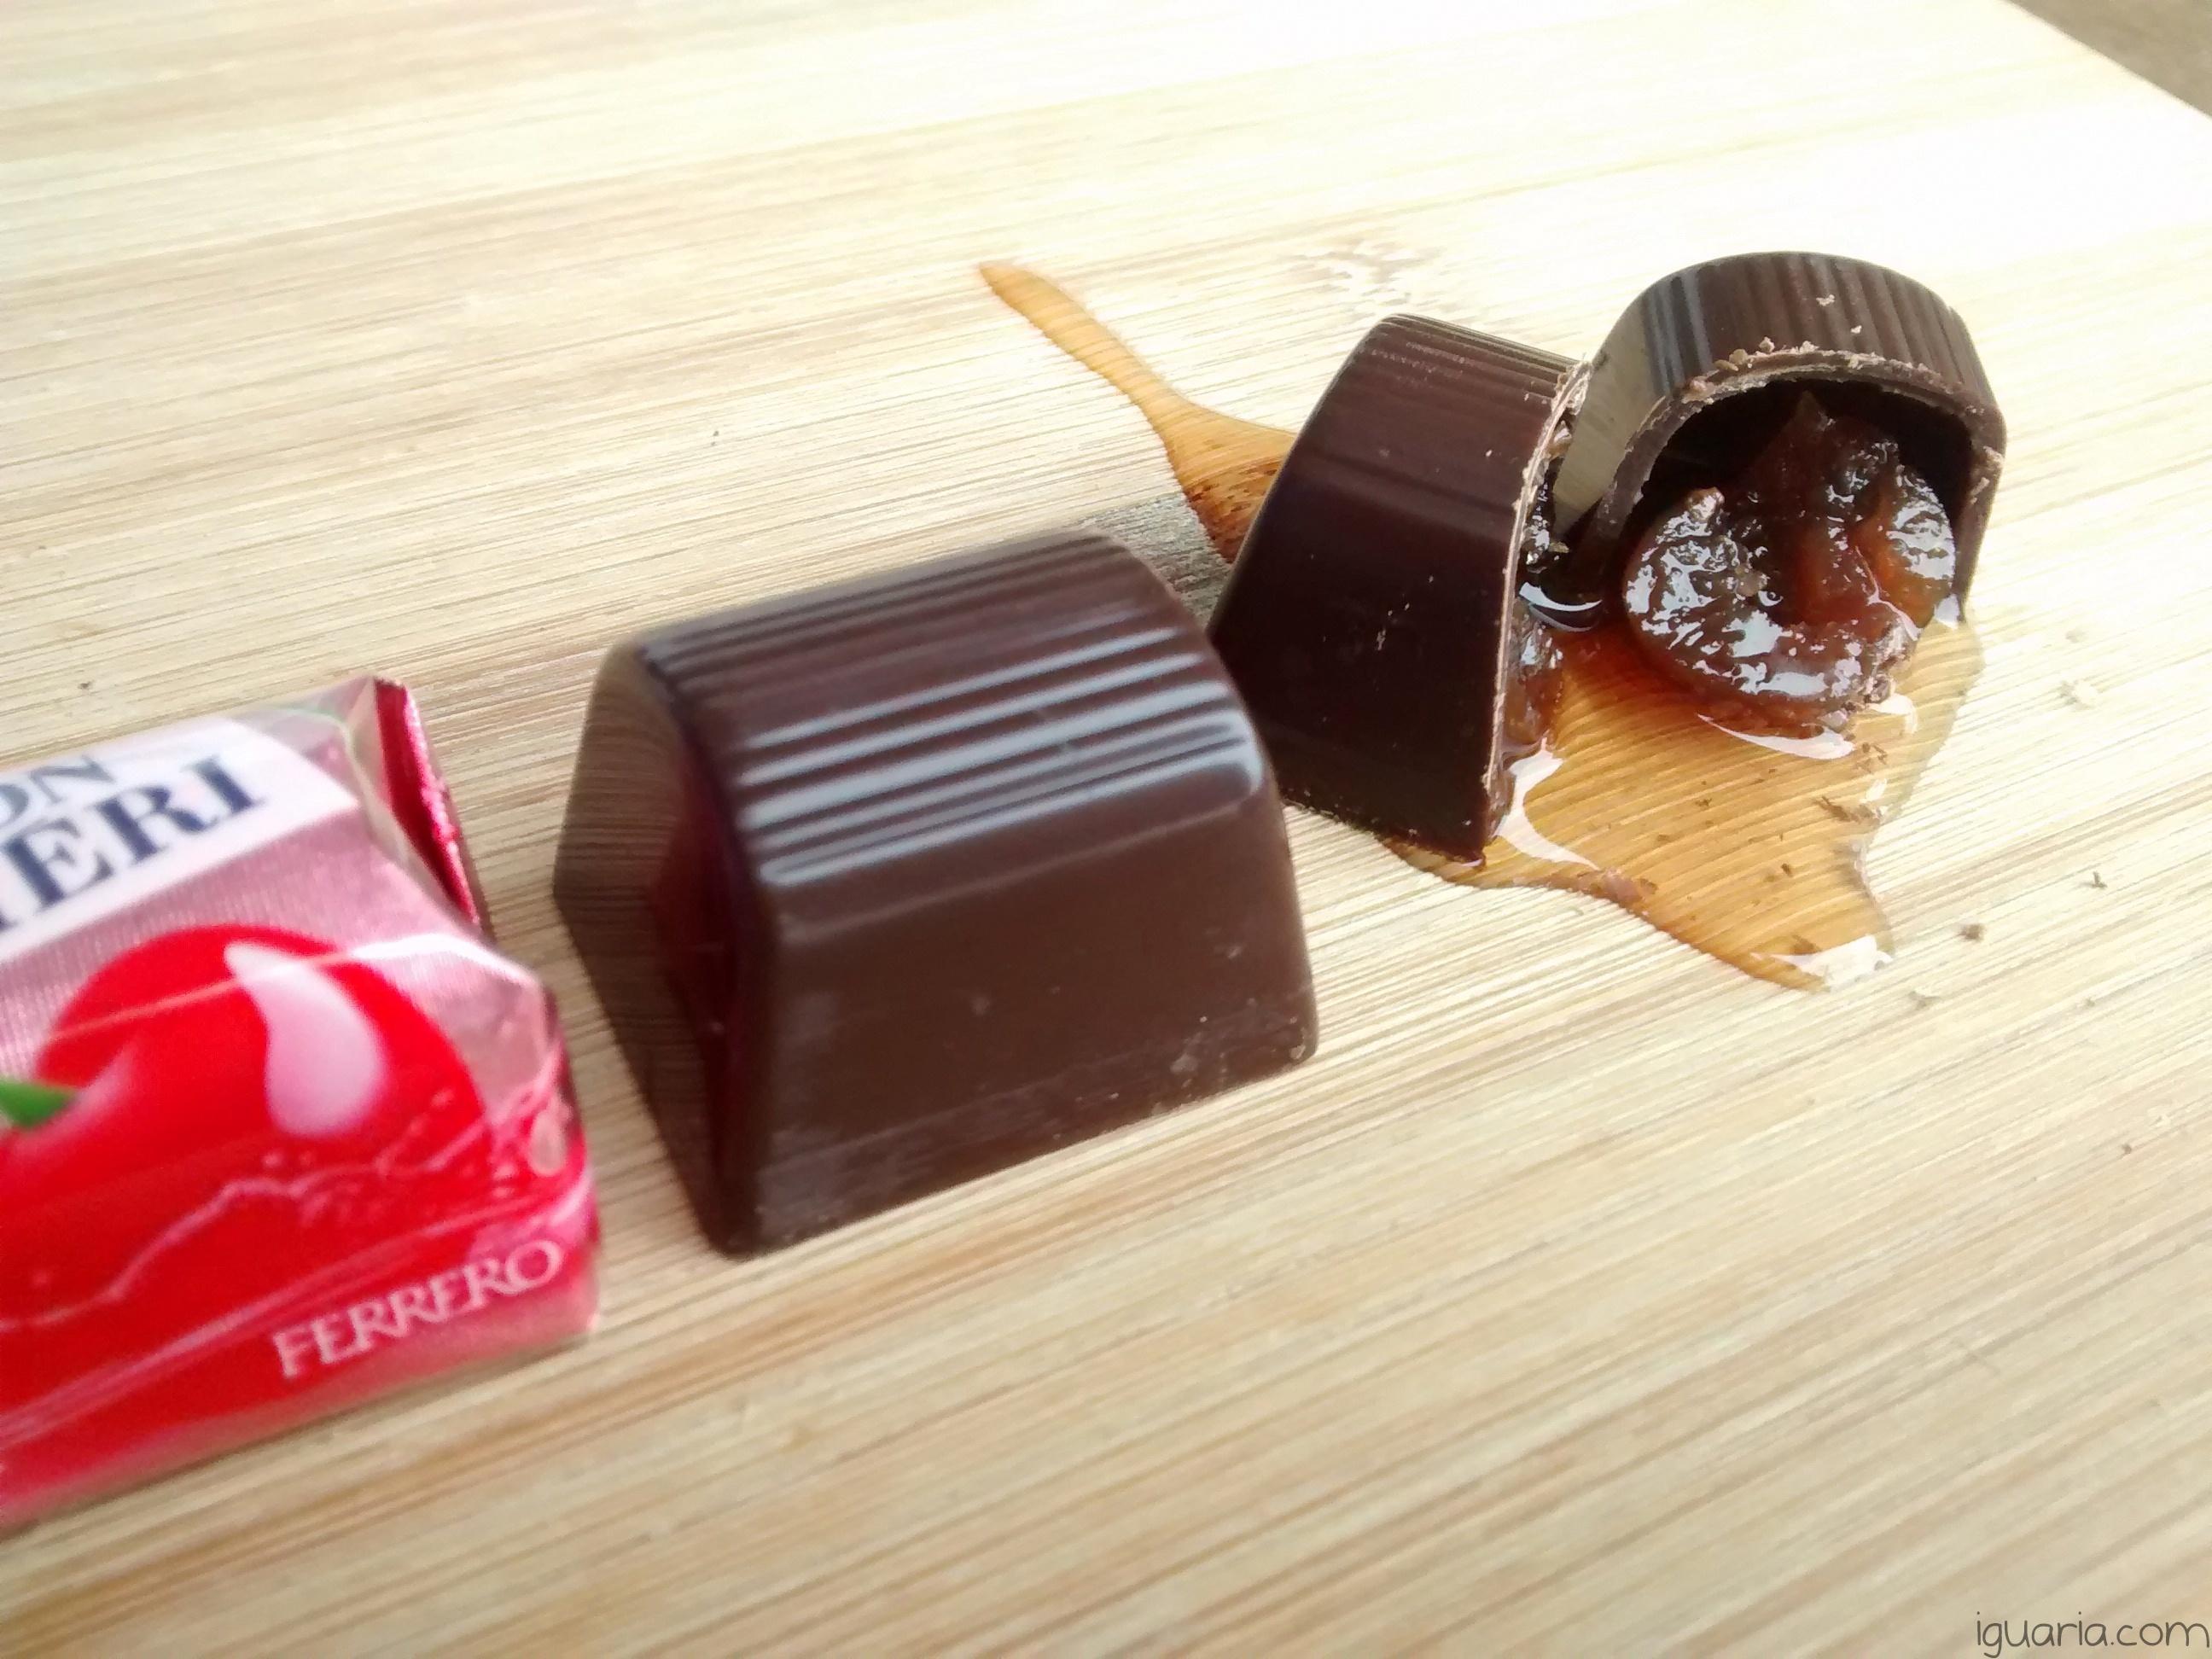 iguaria-bom-bom-mon-cherry